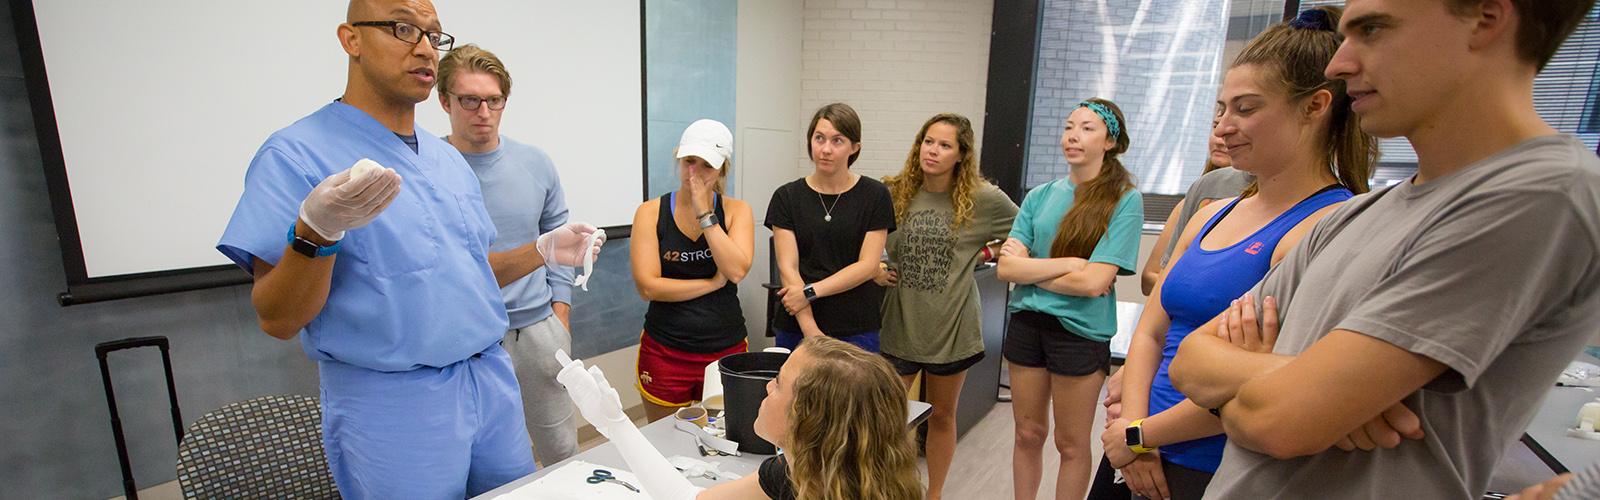 Professor teaching a casting class